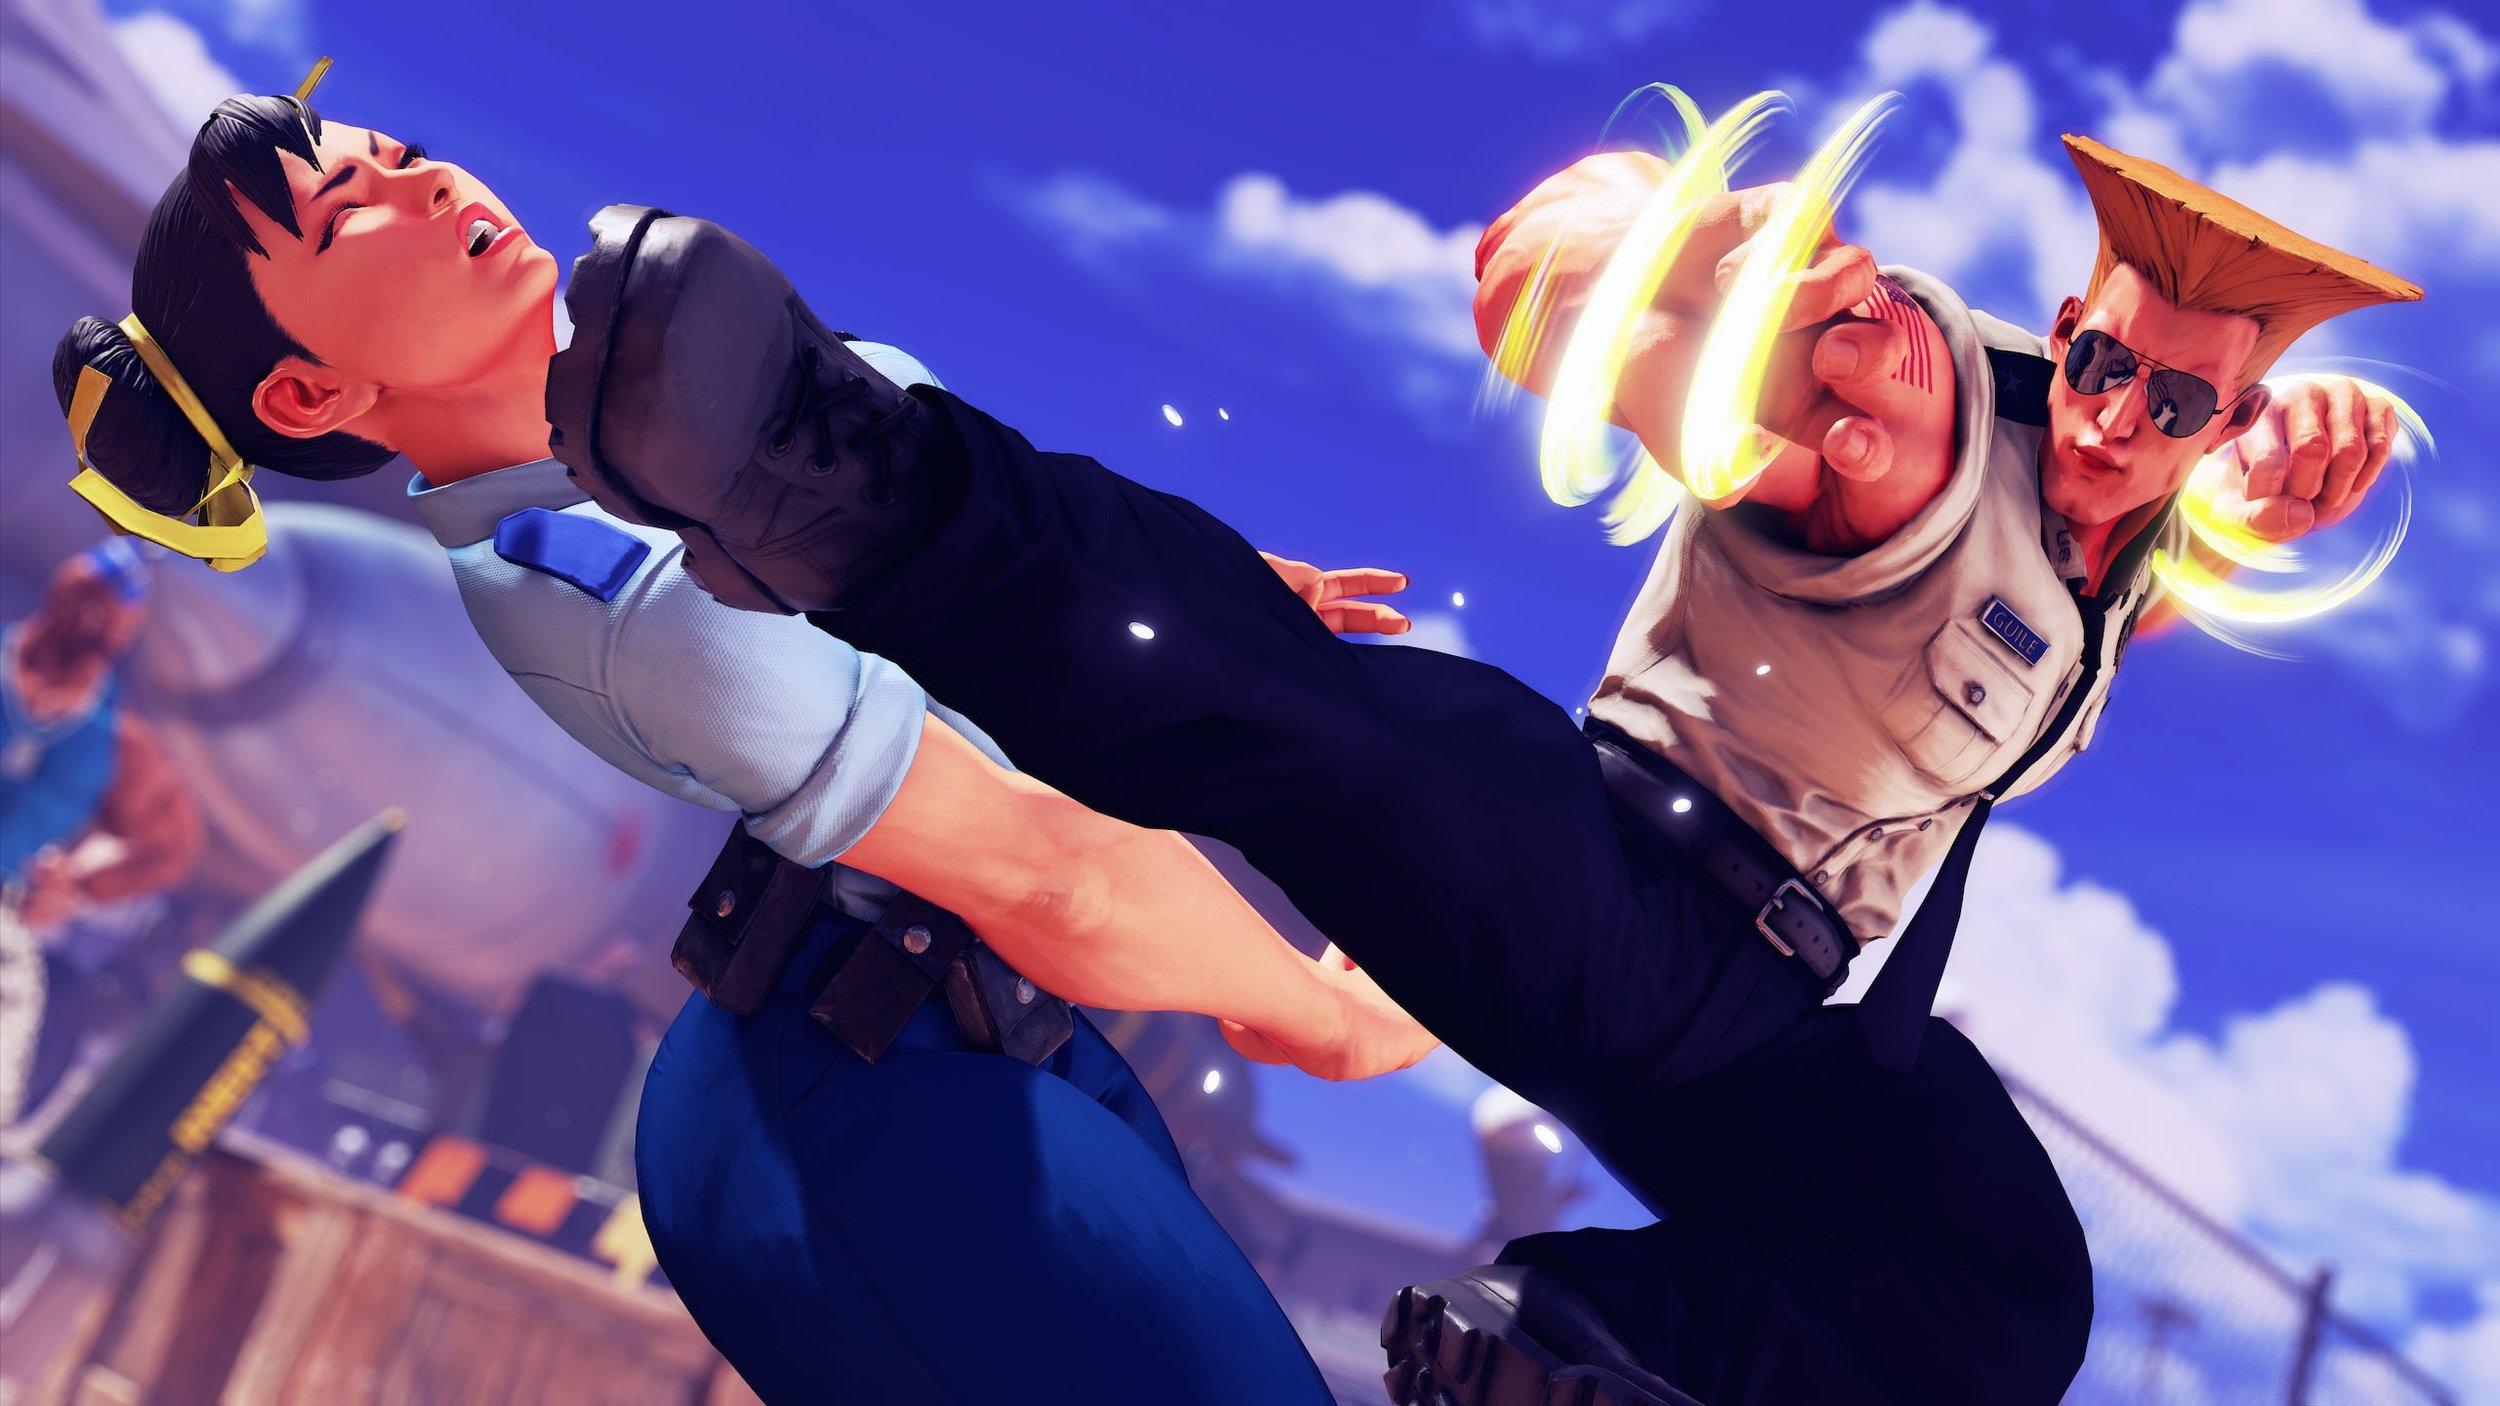 Dark Sided - Street Fighter V Chun Li vs Guile